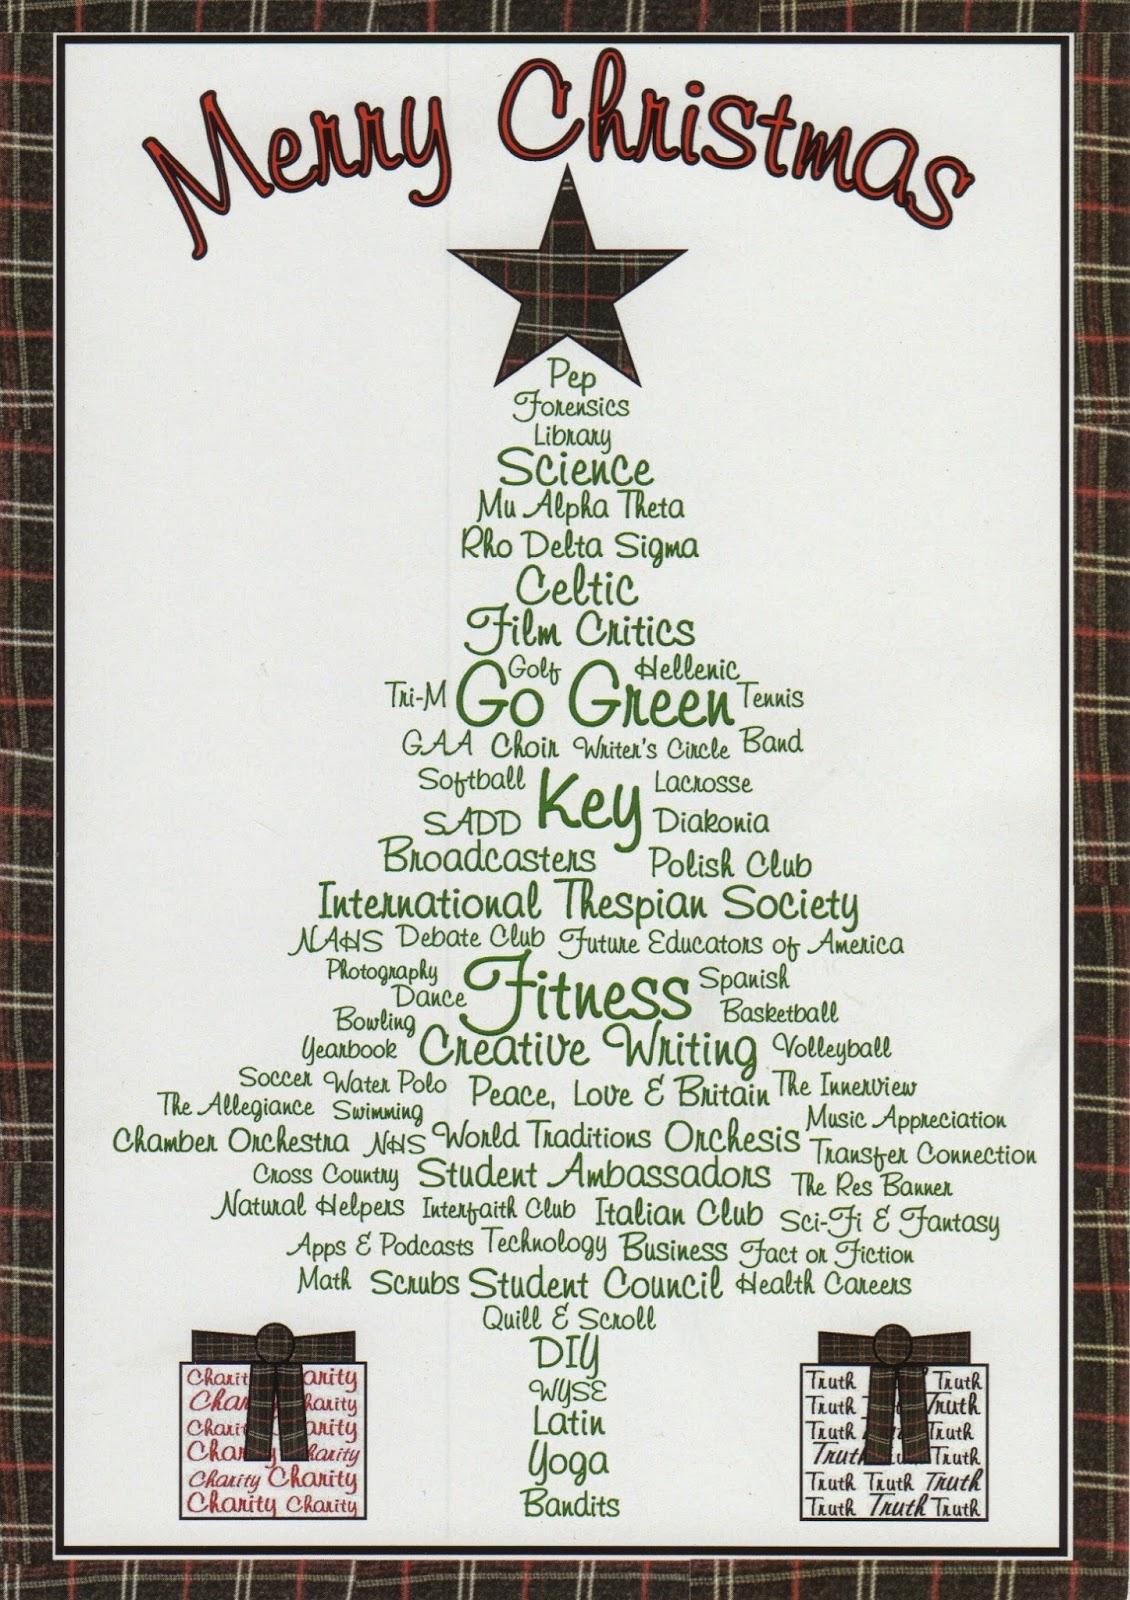 PRESident\'s Blog: Our 2014 Christmas Card